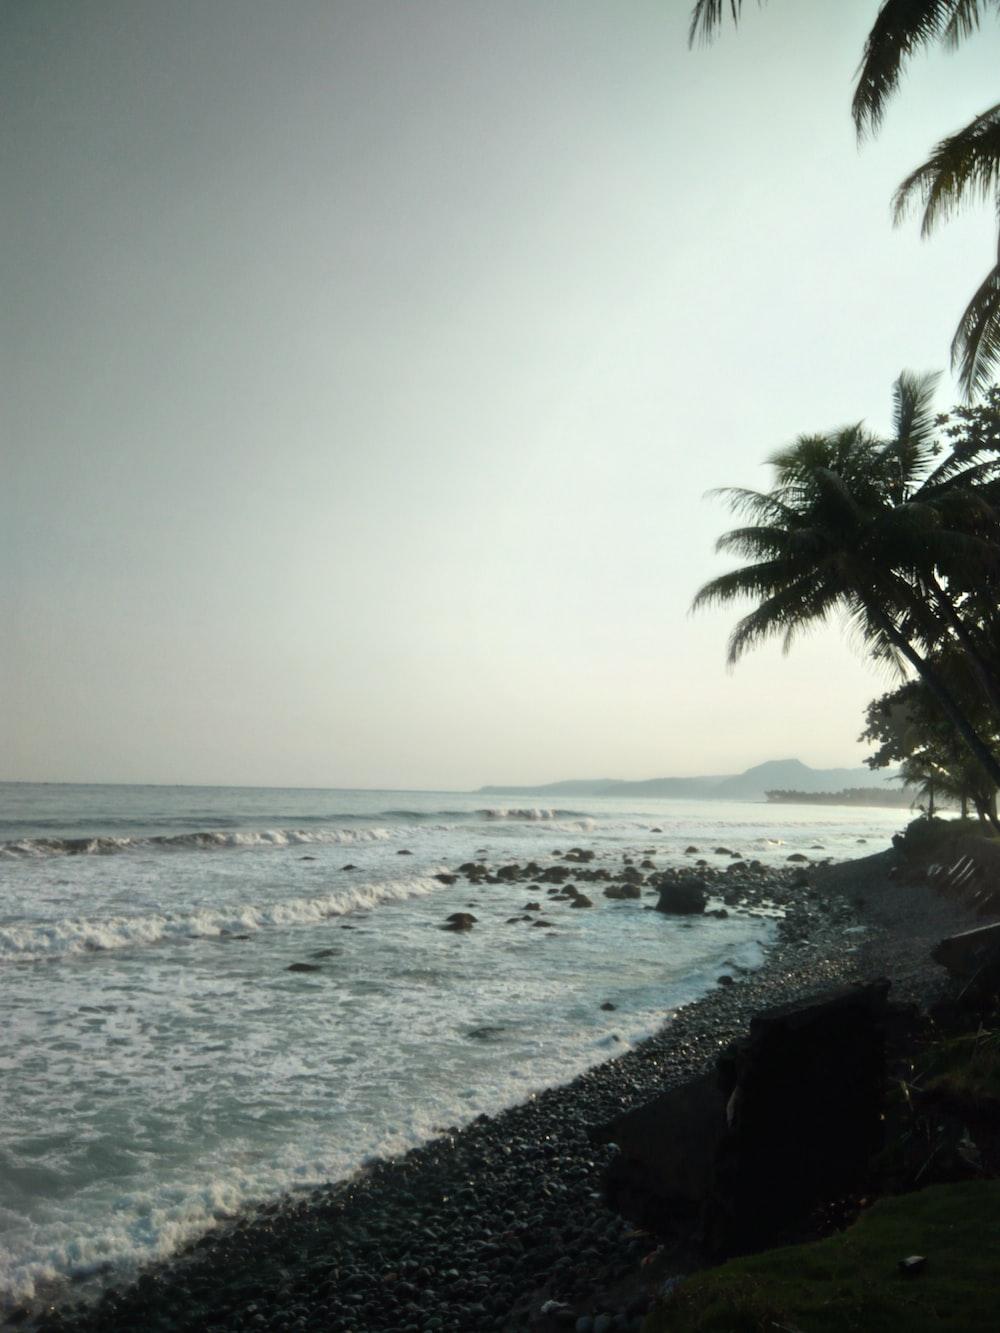 seashore and palm trees